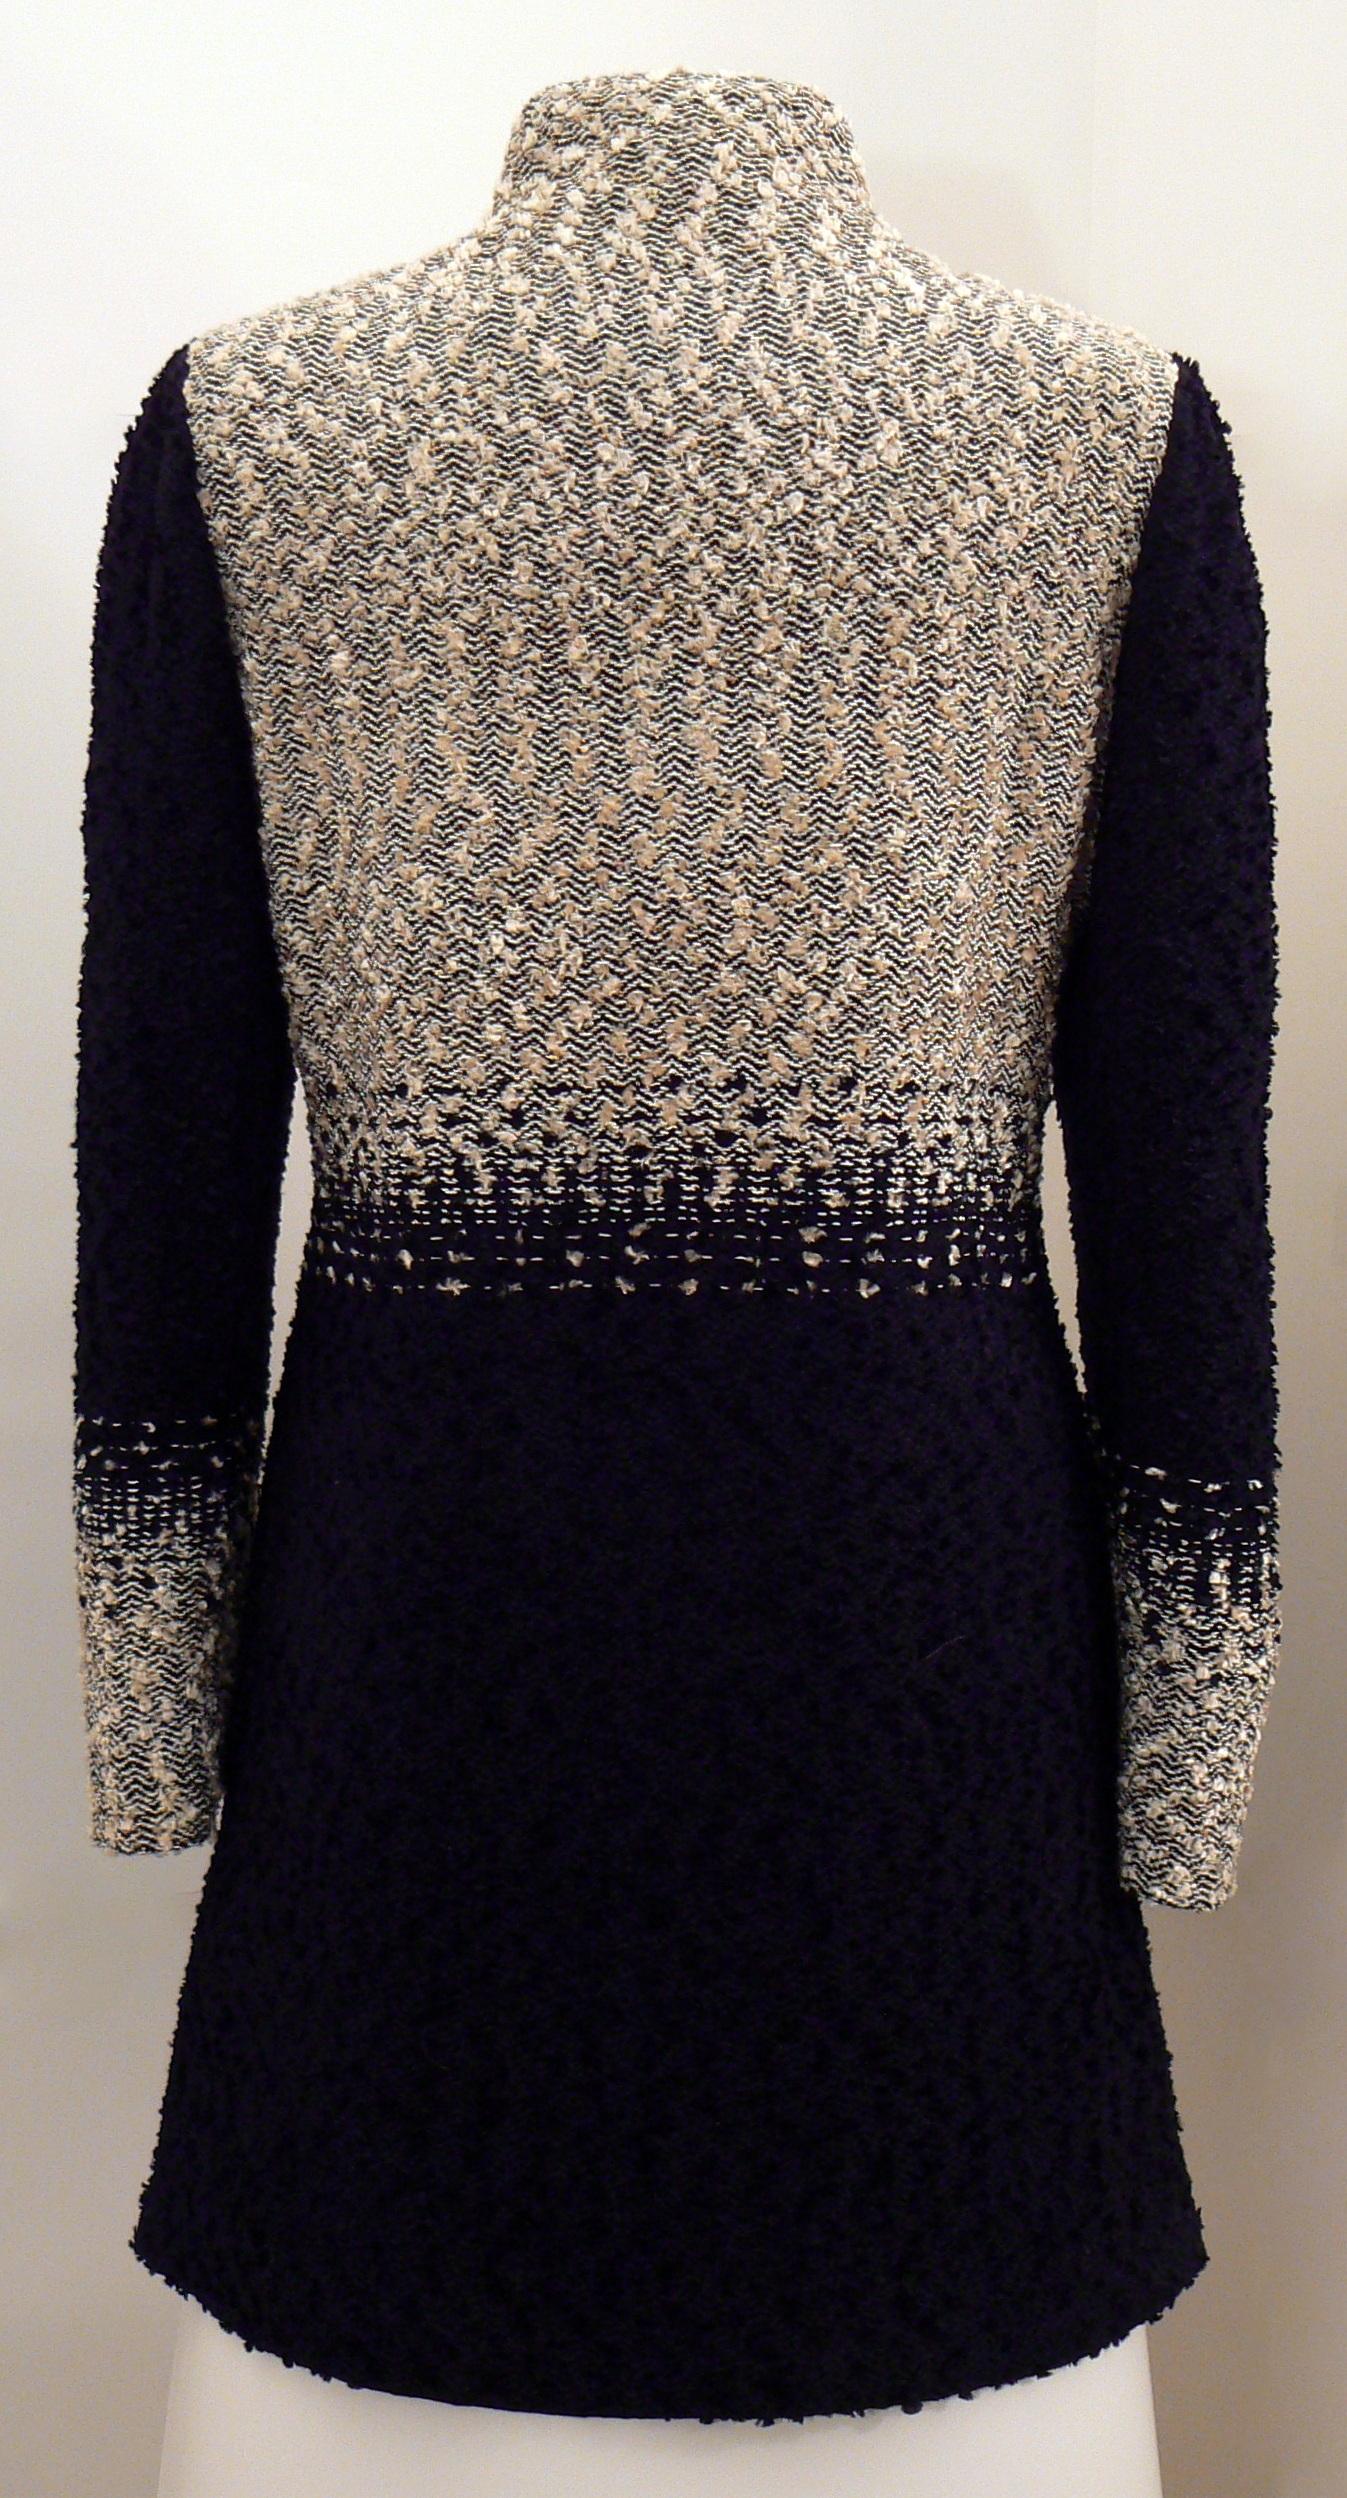 Handwoven Clothing, Coats, Kathleen Weir-West, 8-001.JPG